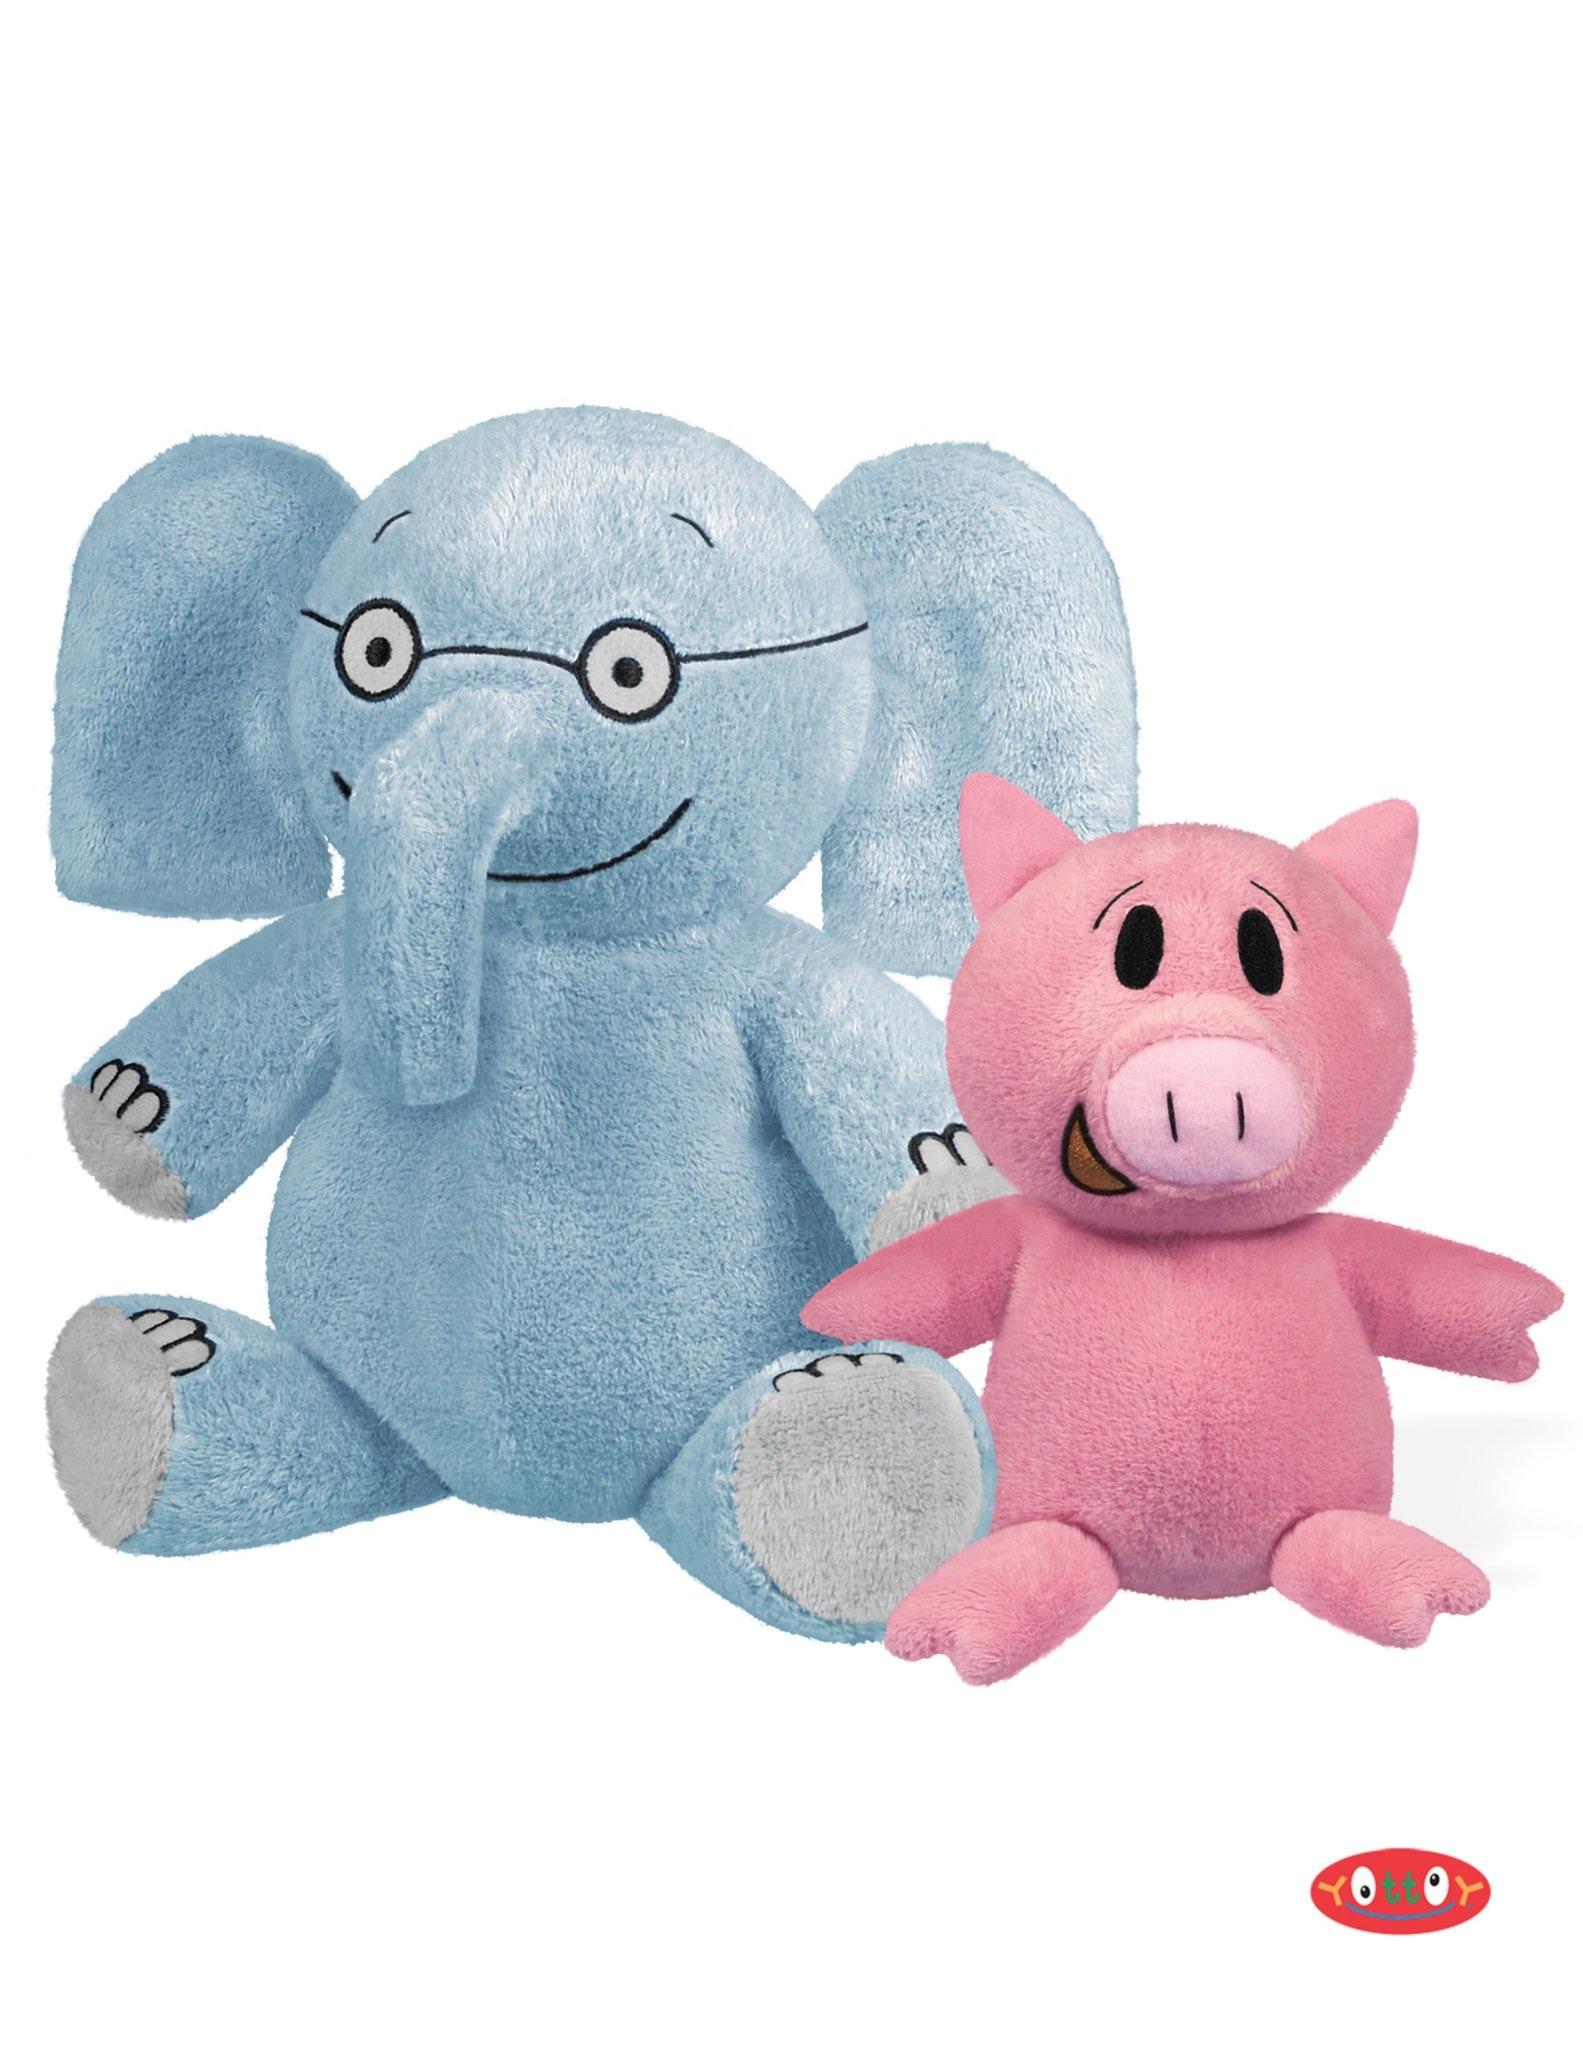 Elephant & Piggie (Plush Toys)